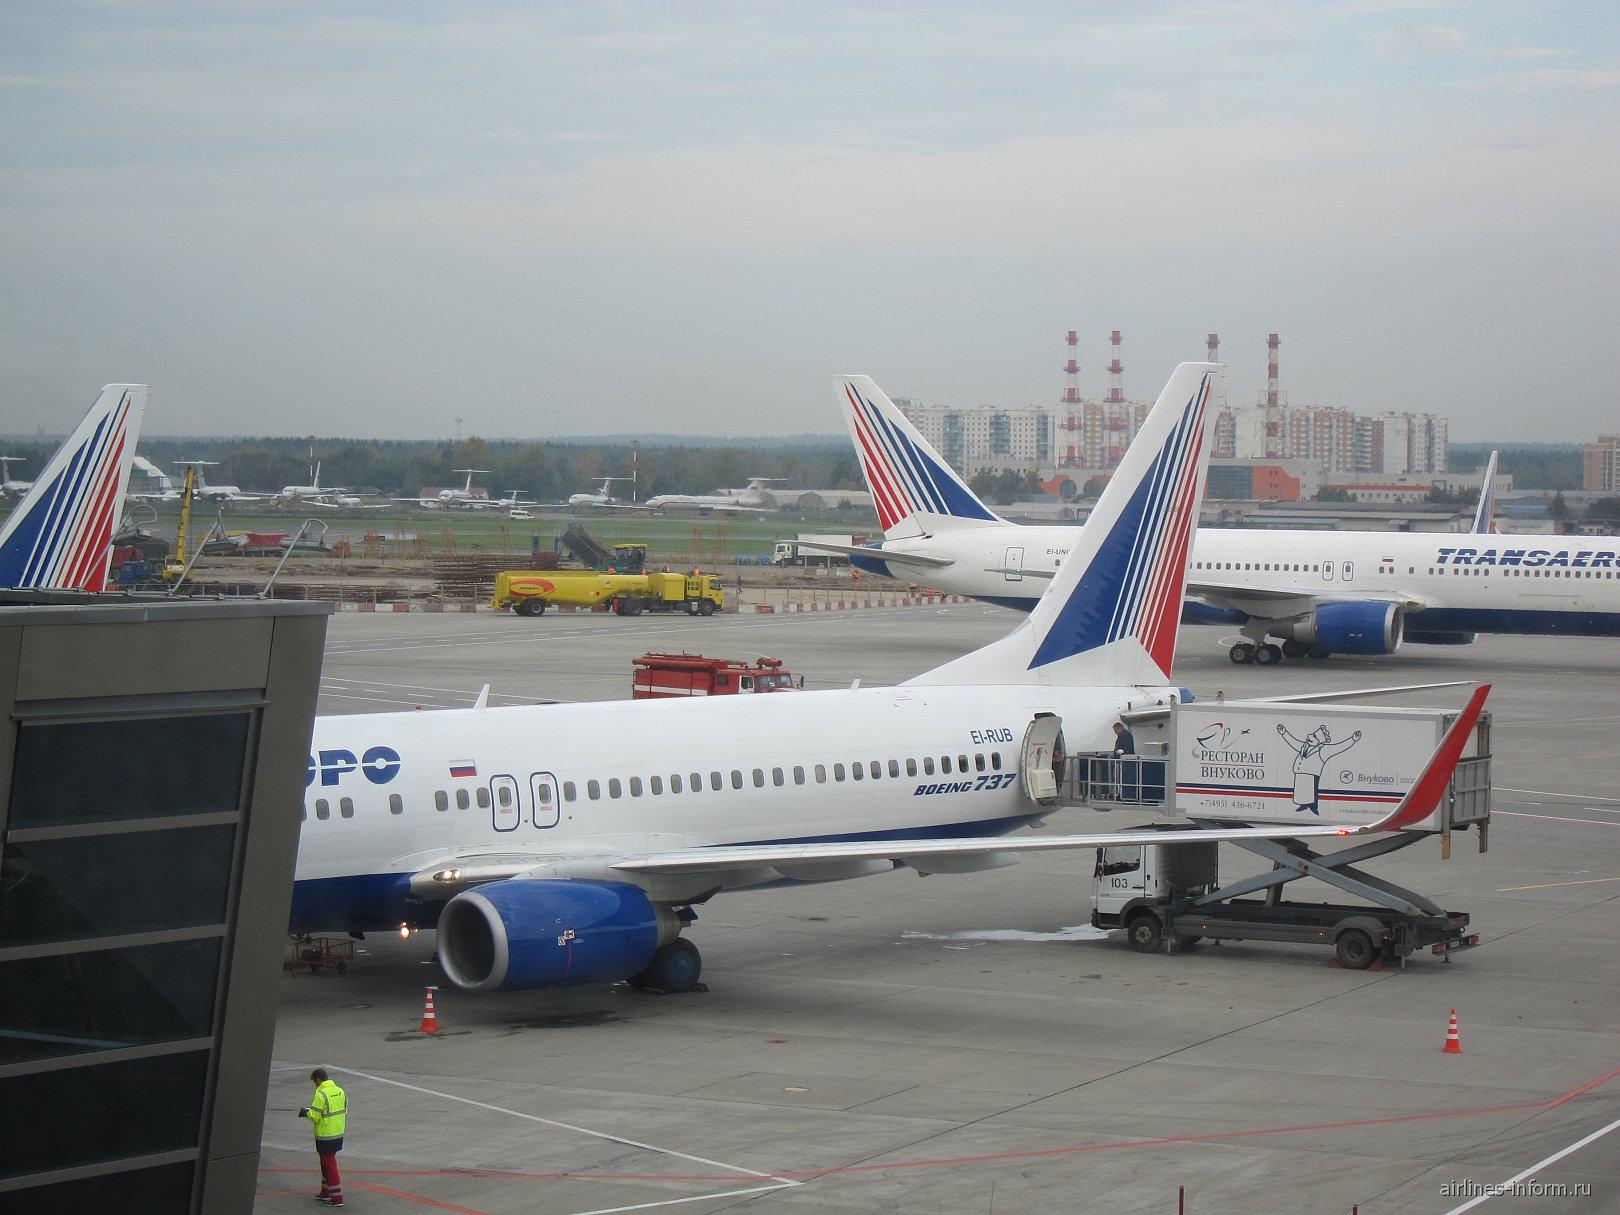 Боинг-737-800 авиакомпании Трансаэро в аэропорту Внуково